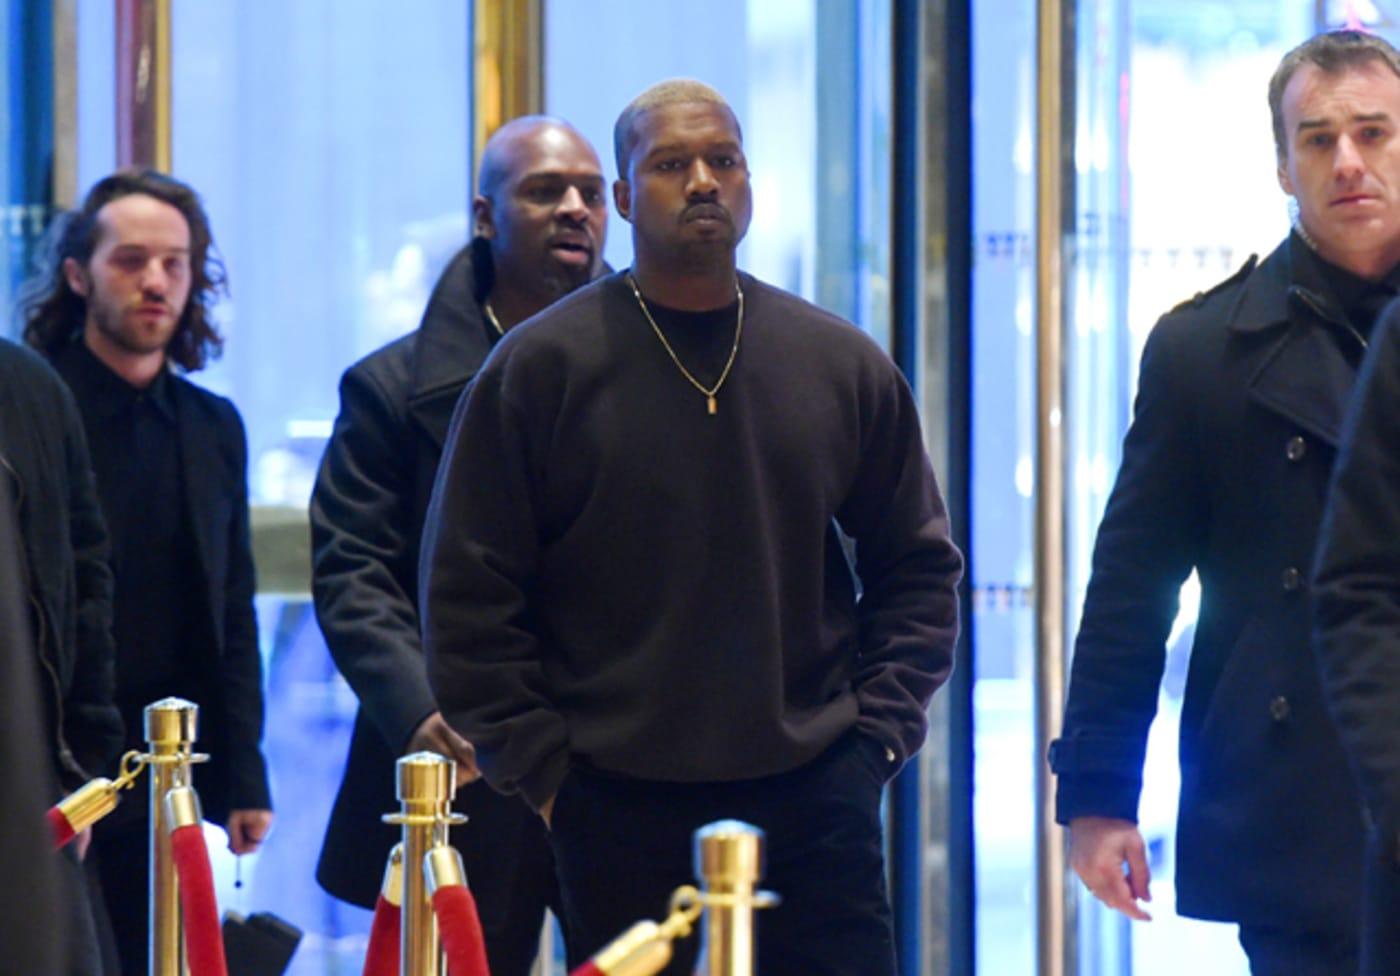 Kanye West meets Donald Trump at Trump Tower